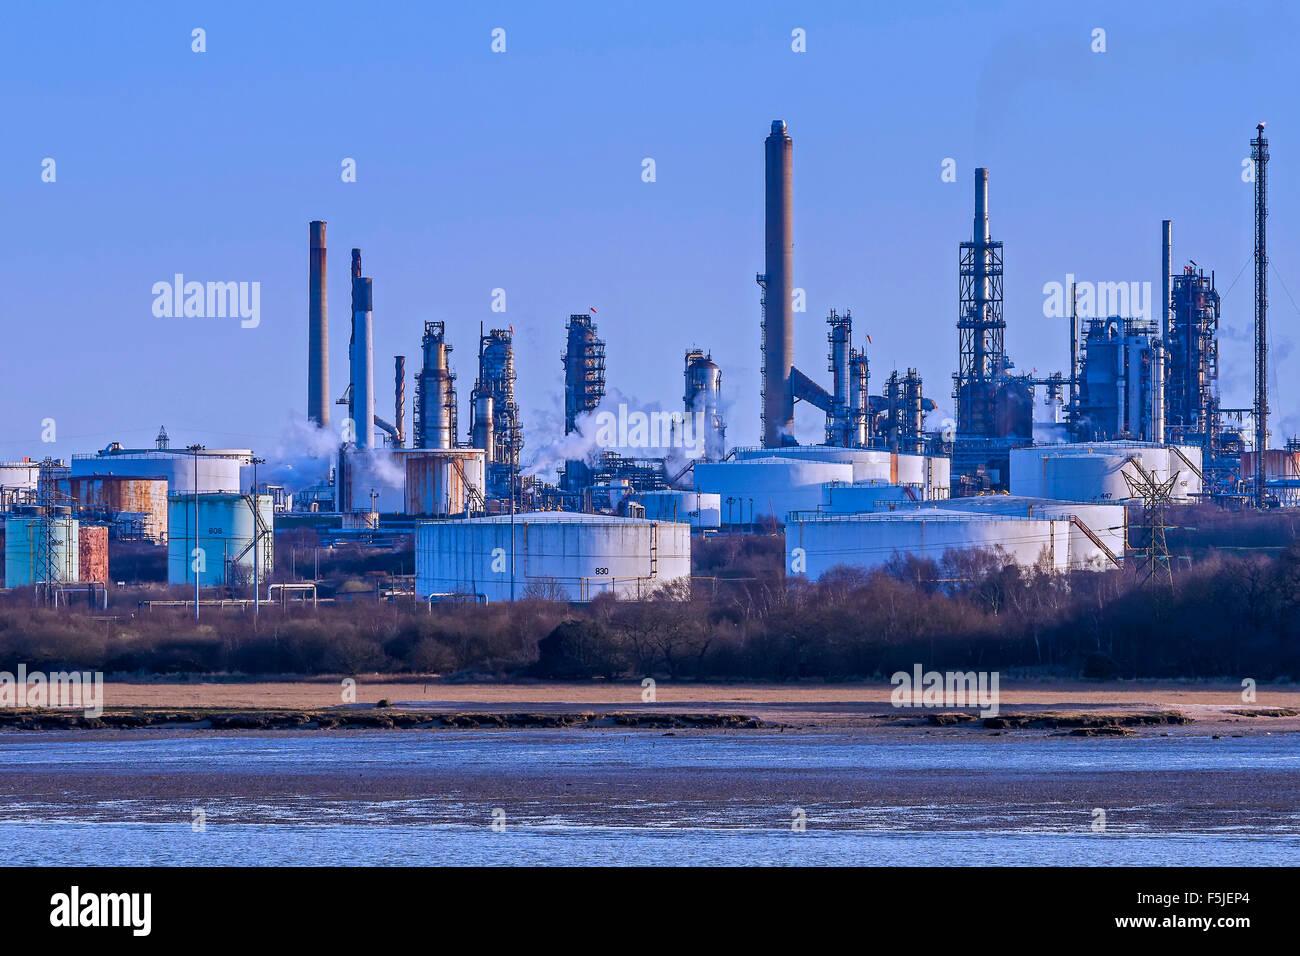 Fawley Oil Refinery Southampton UK - Stock Image